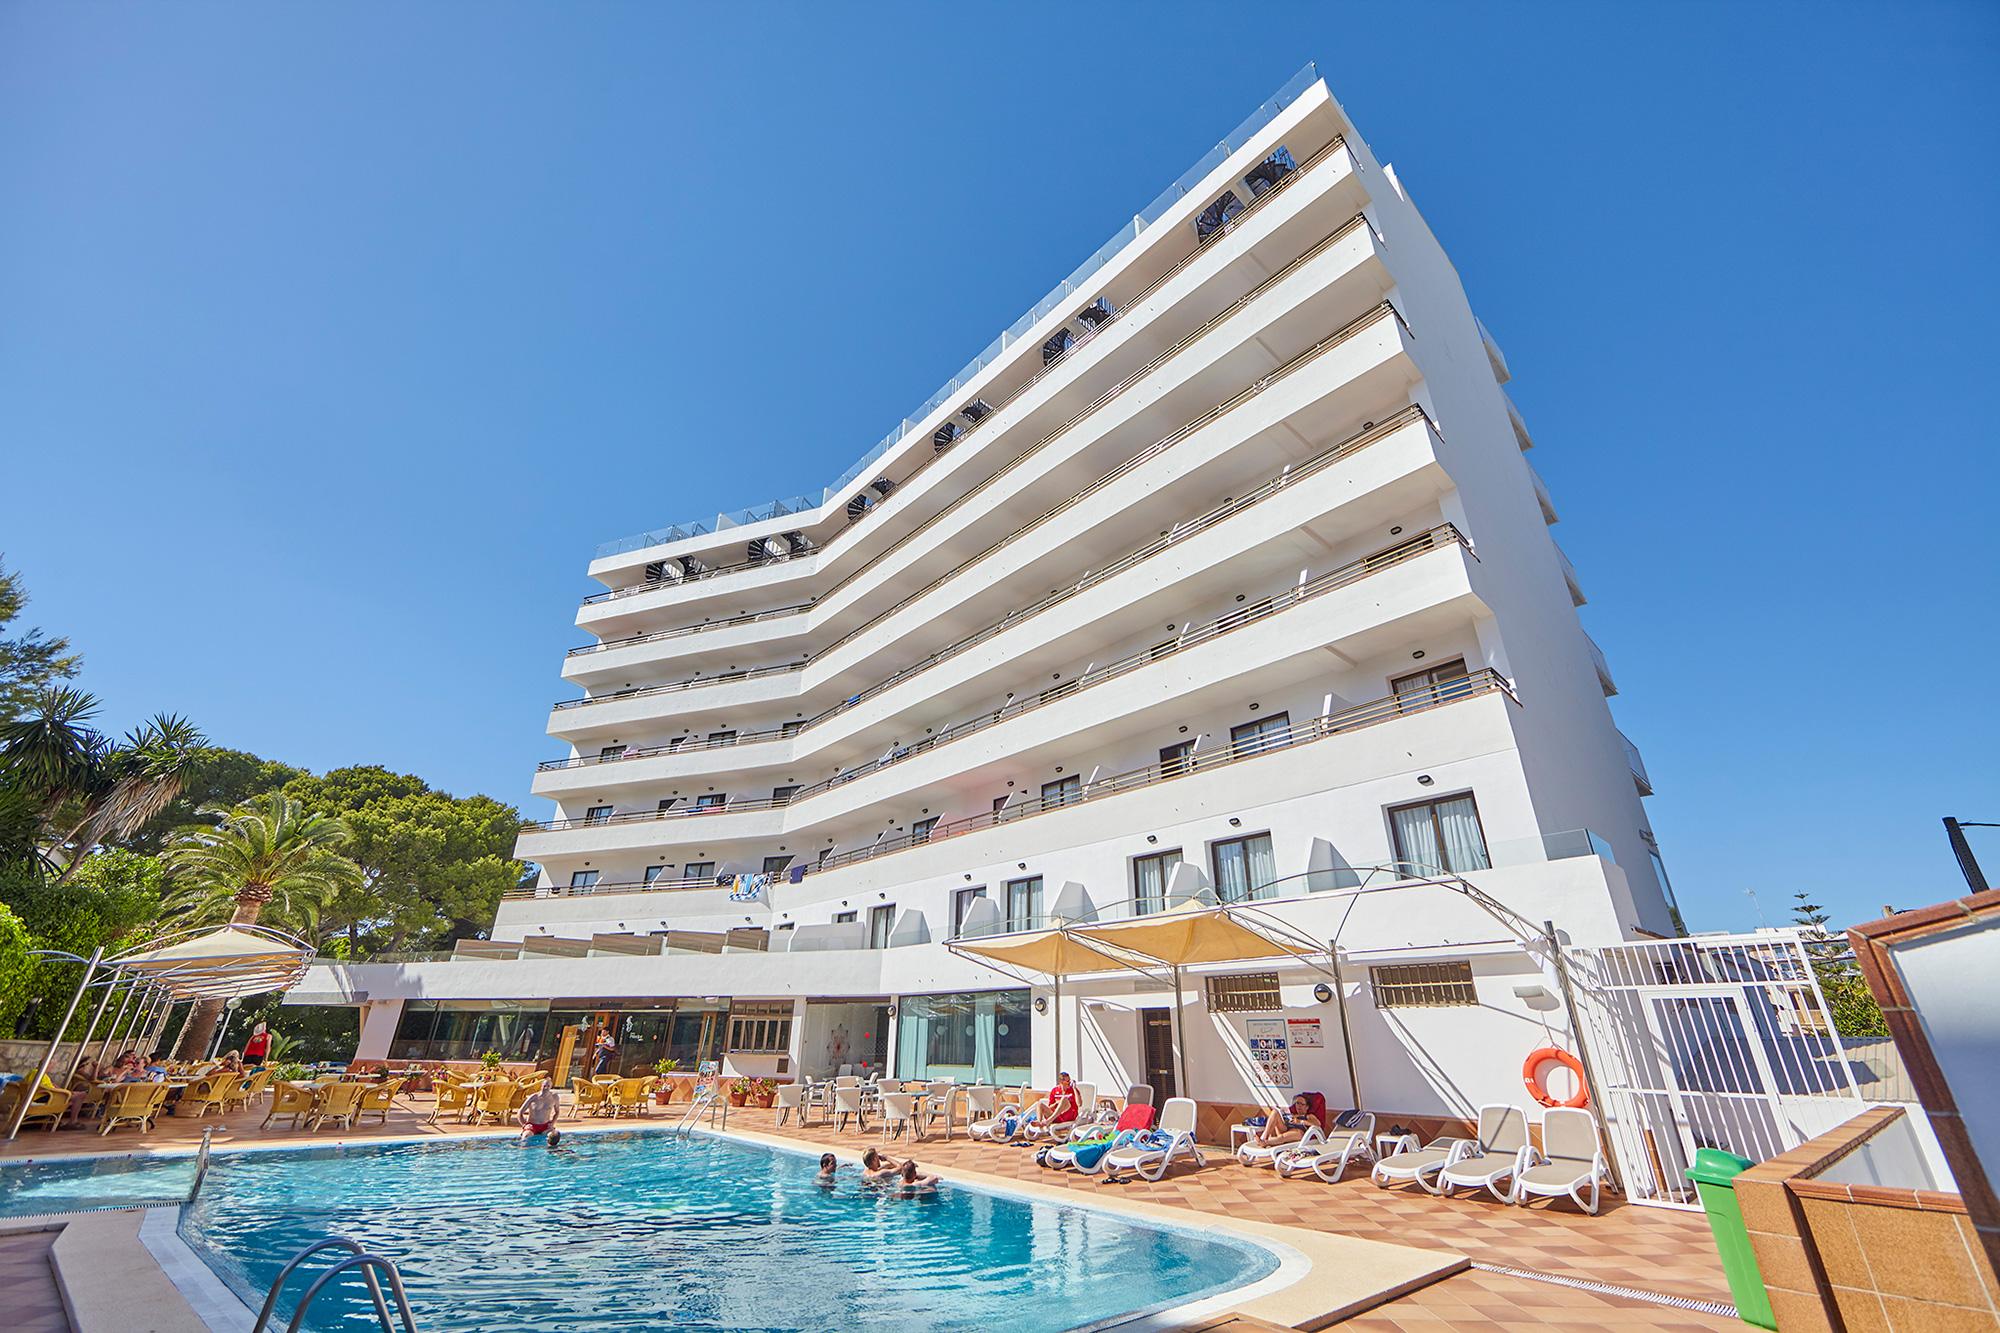 Hotel pincipe mallorca club blaues meer reisen for Kapfer pool design mallorca